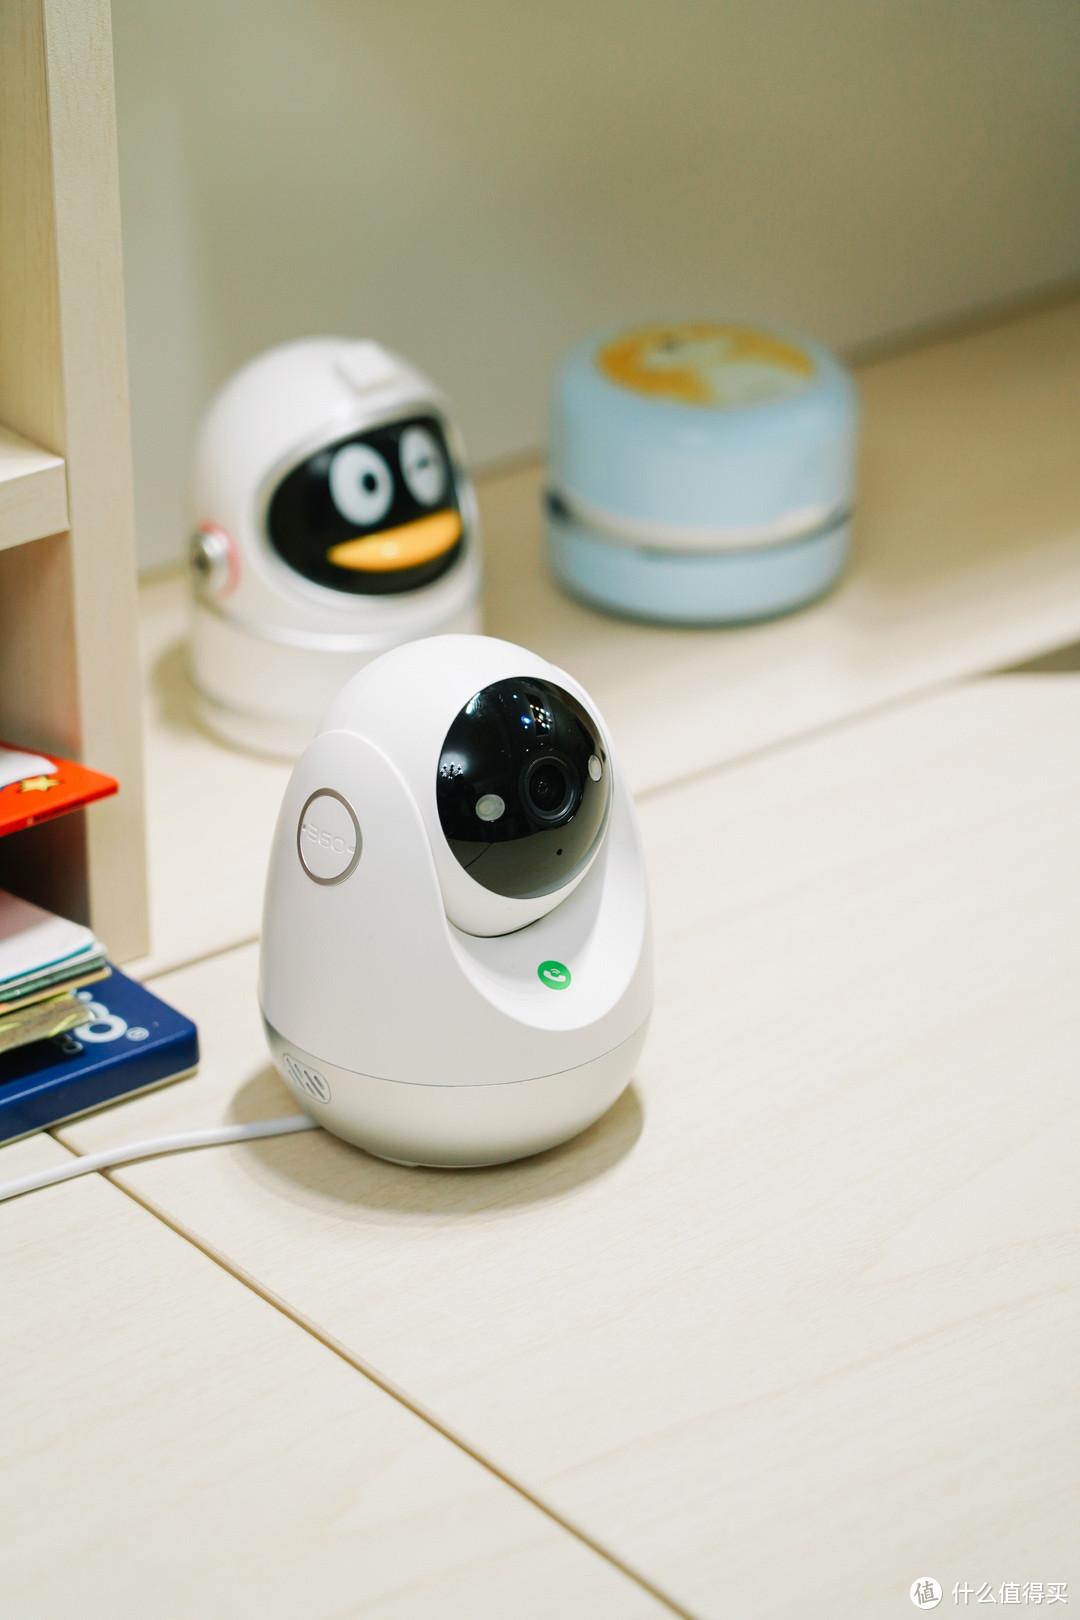 2.5K全彩夜视,一键呼叫智能报警:360摄像机云台 7C 超清版